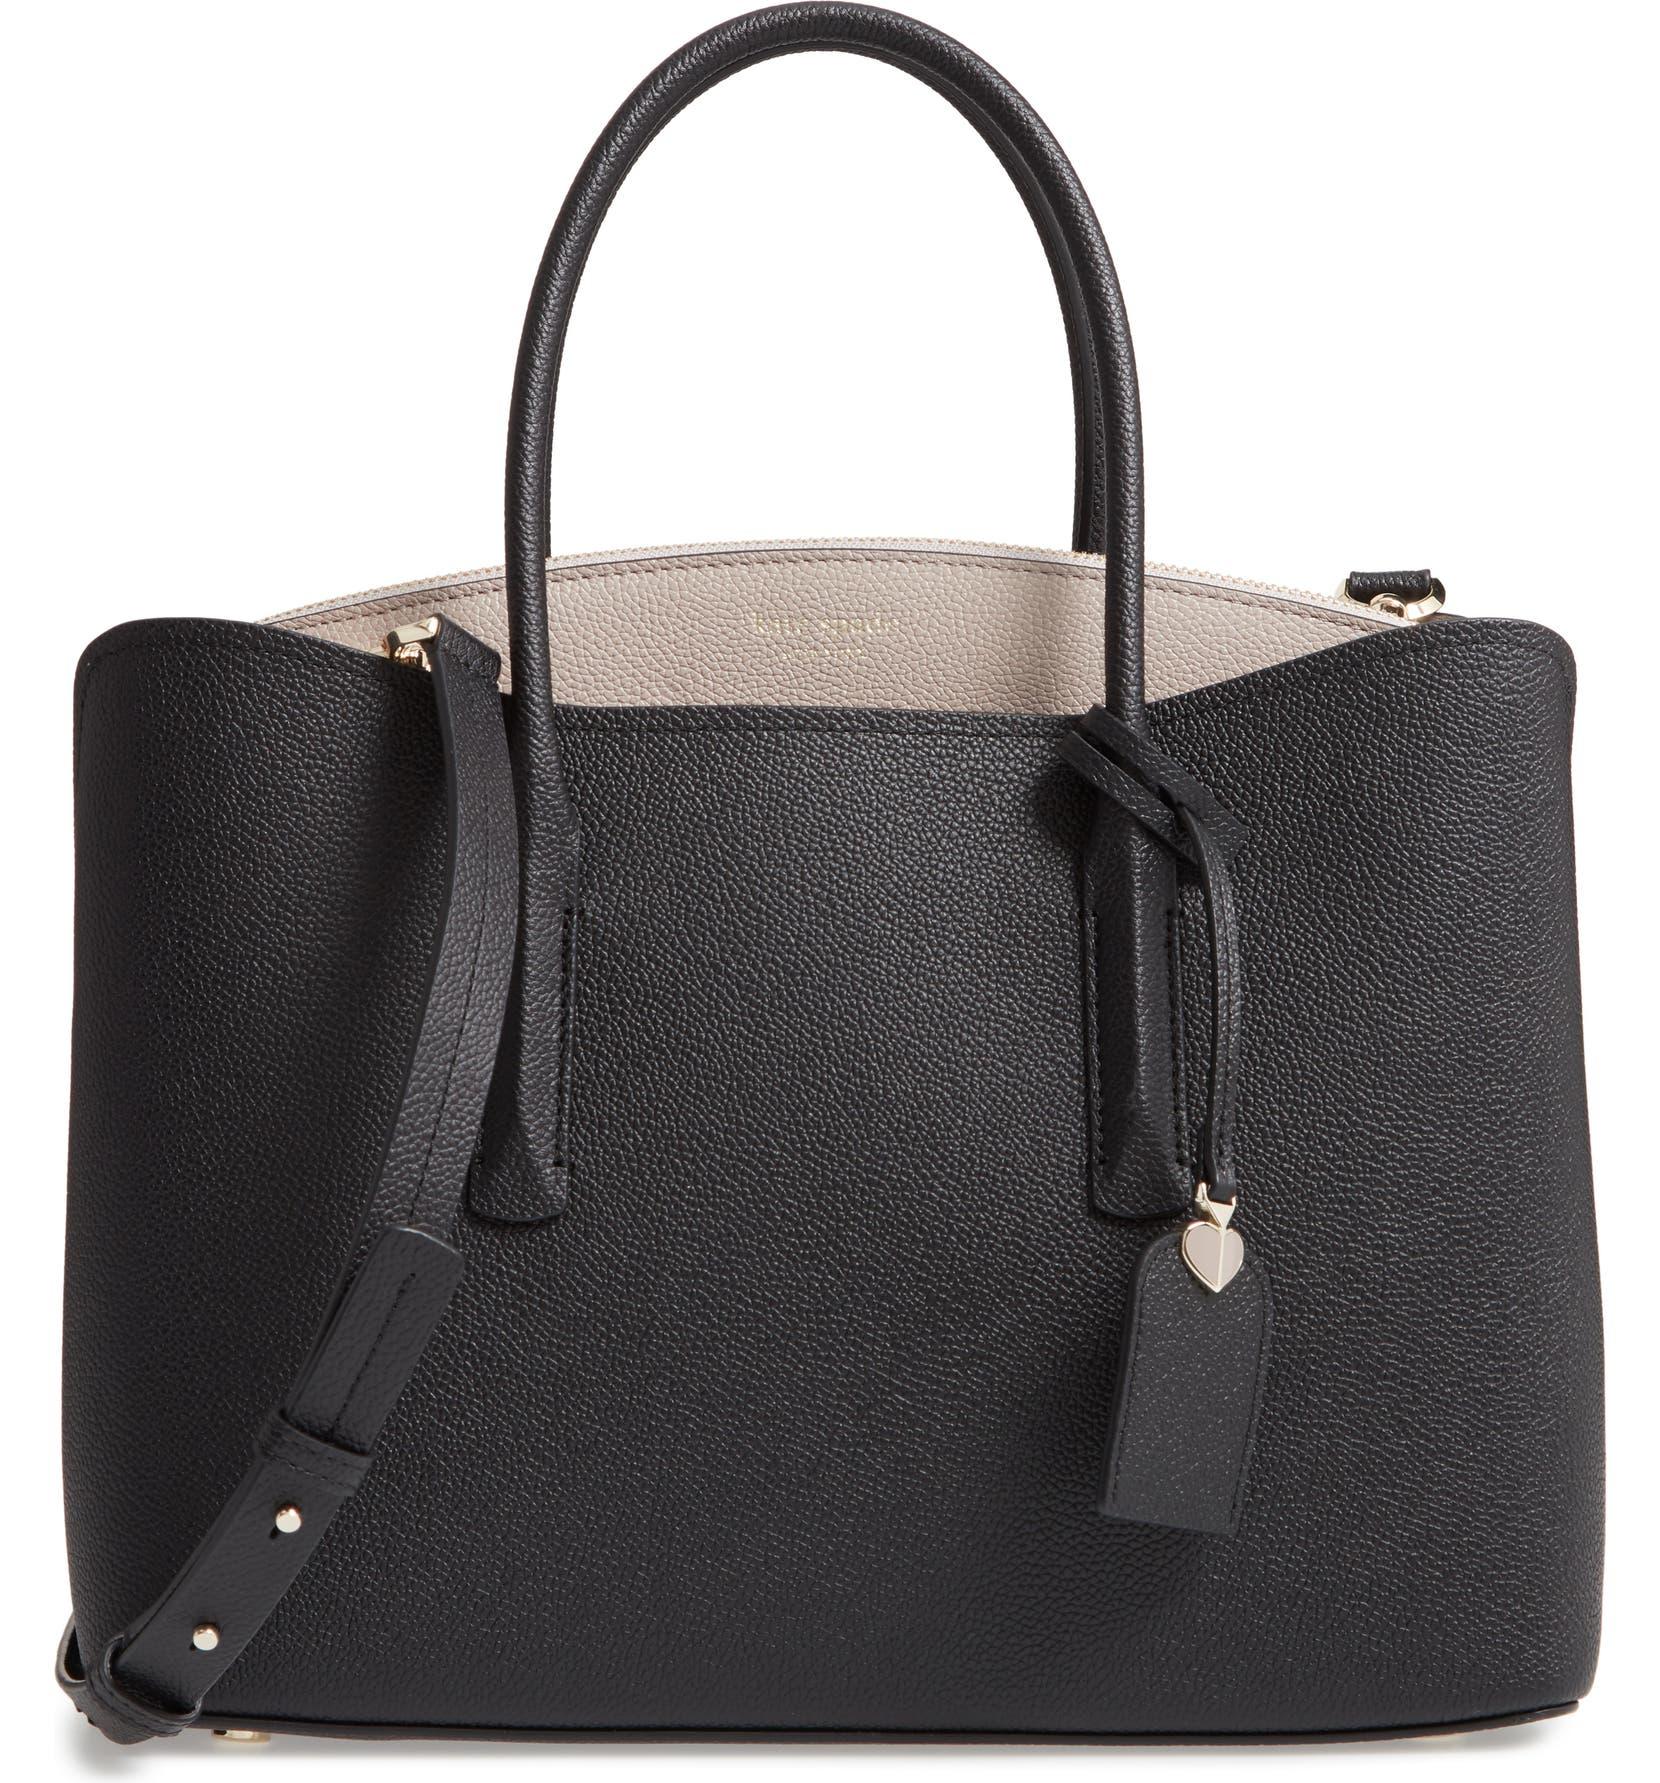 fabfd19546b4 large margaux leather satchel